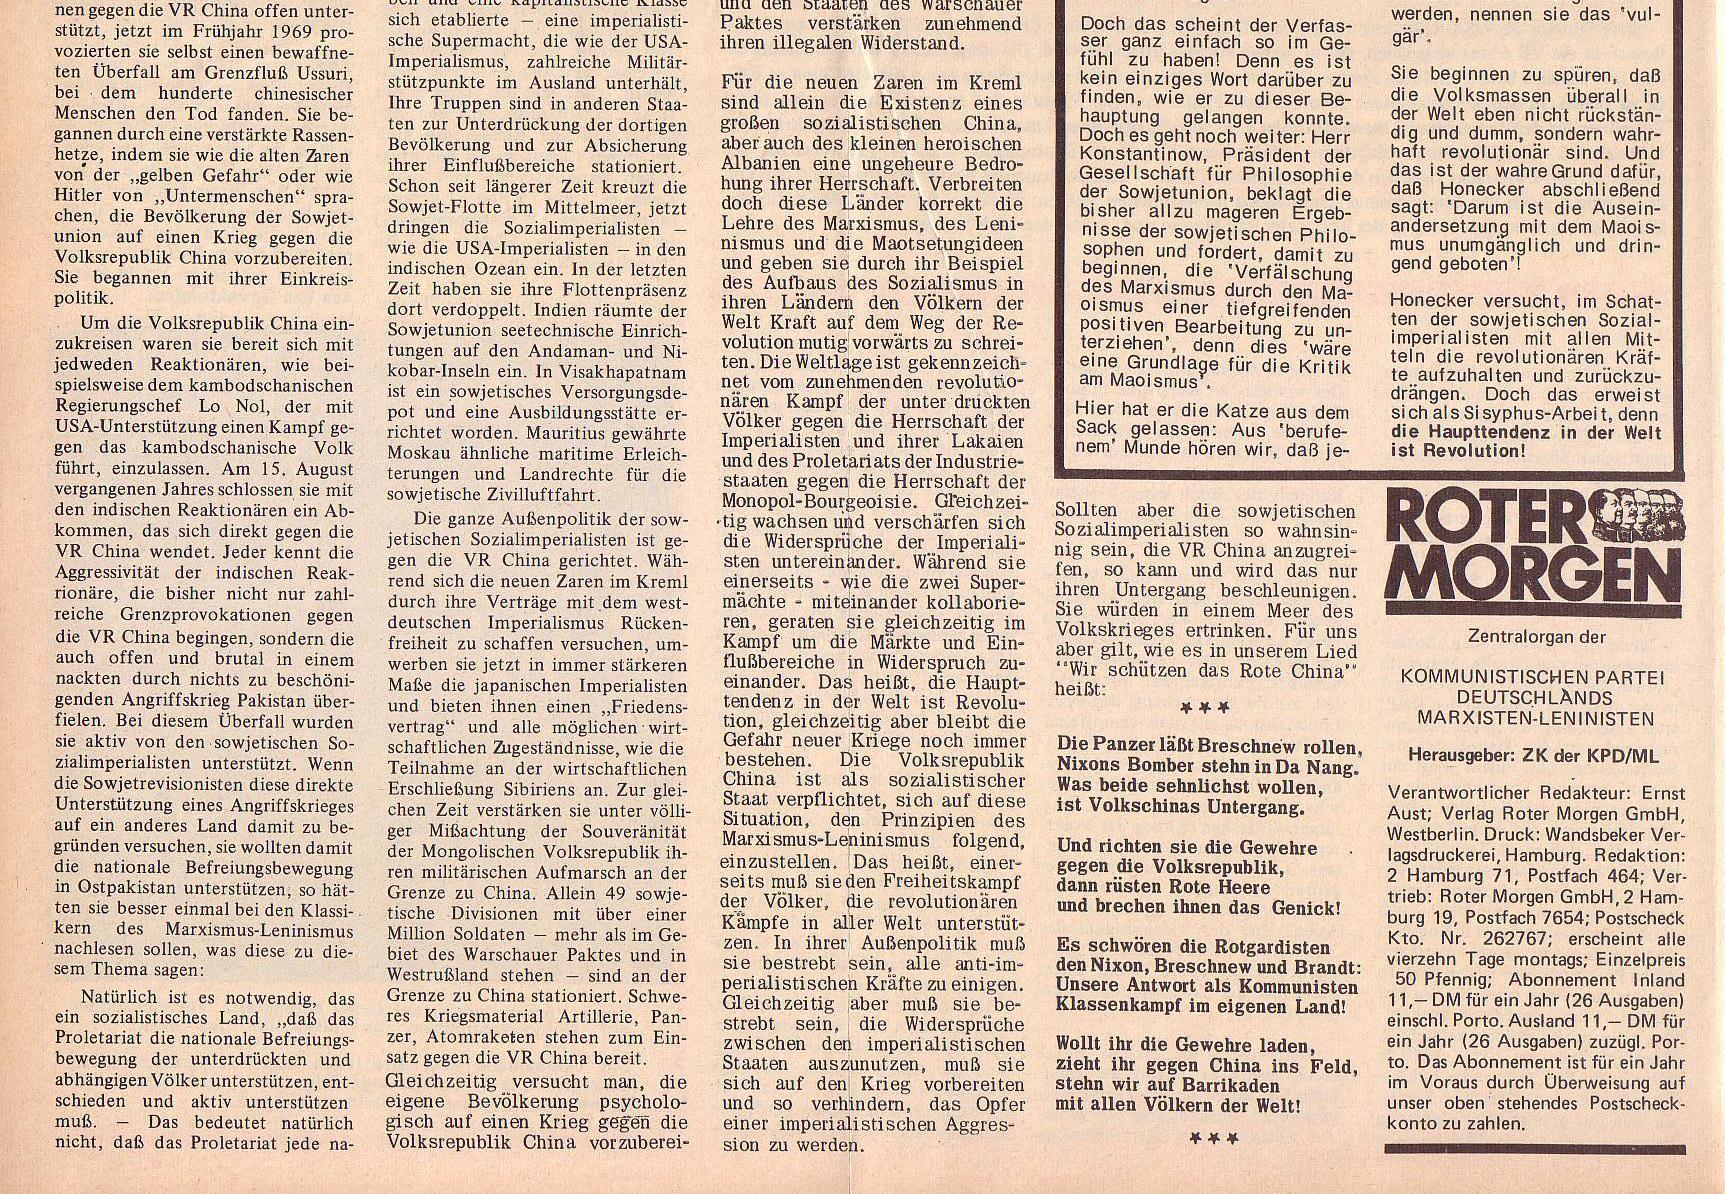 Roter Morgen, 6. Jg., 14. Februar 1972, Nr. 4, Seite 2b